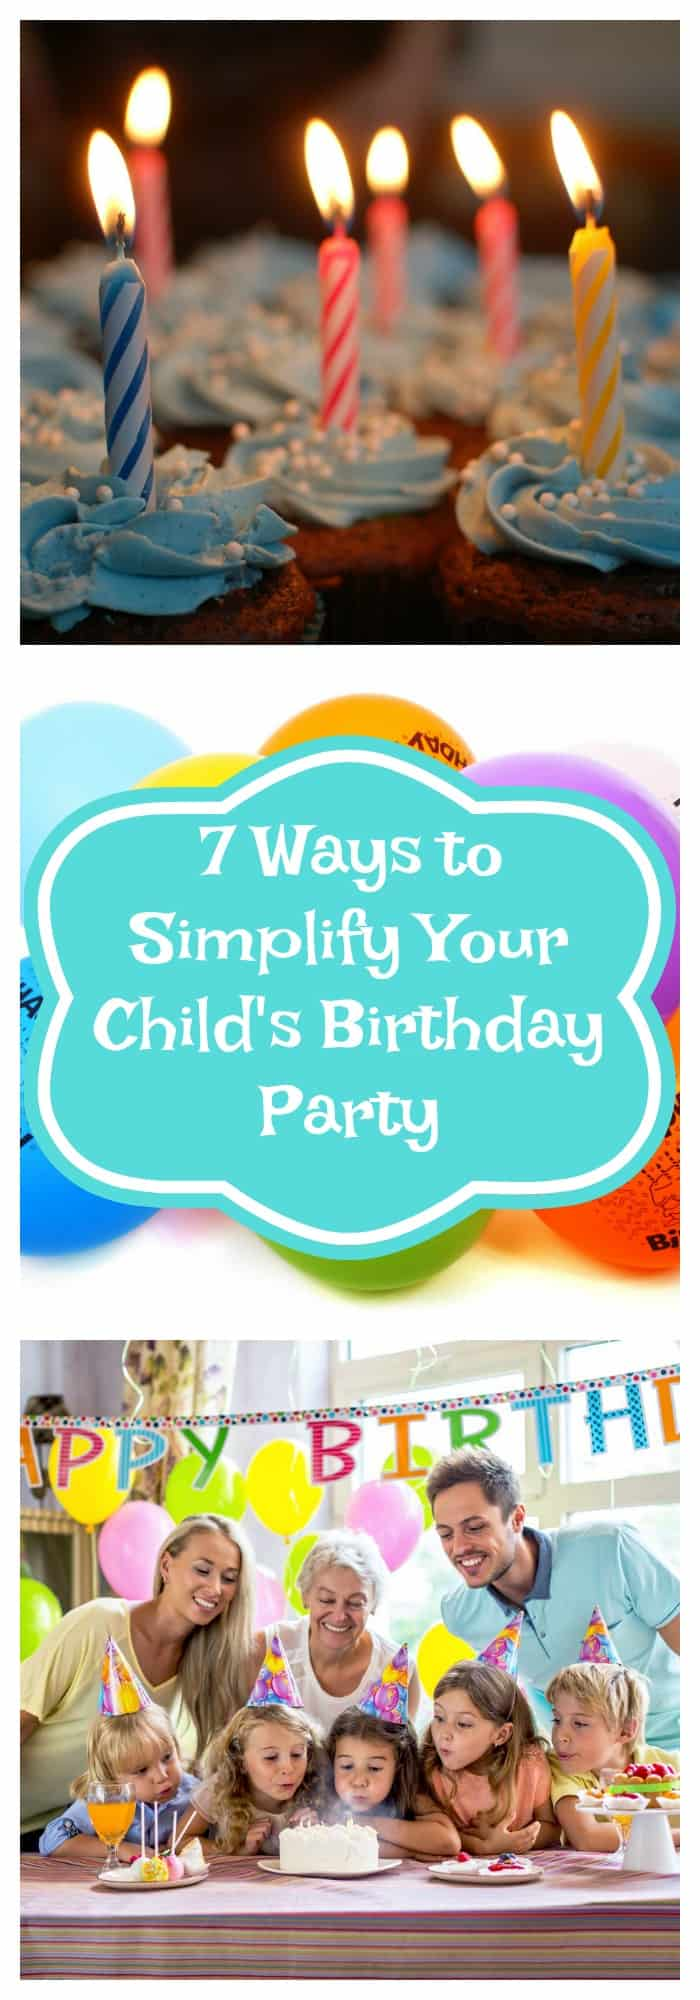 Birthday- 7 Ways to Simplify Your Child's Birthday Party- The Organized Mom